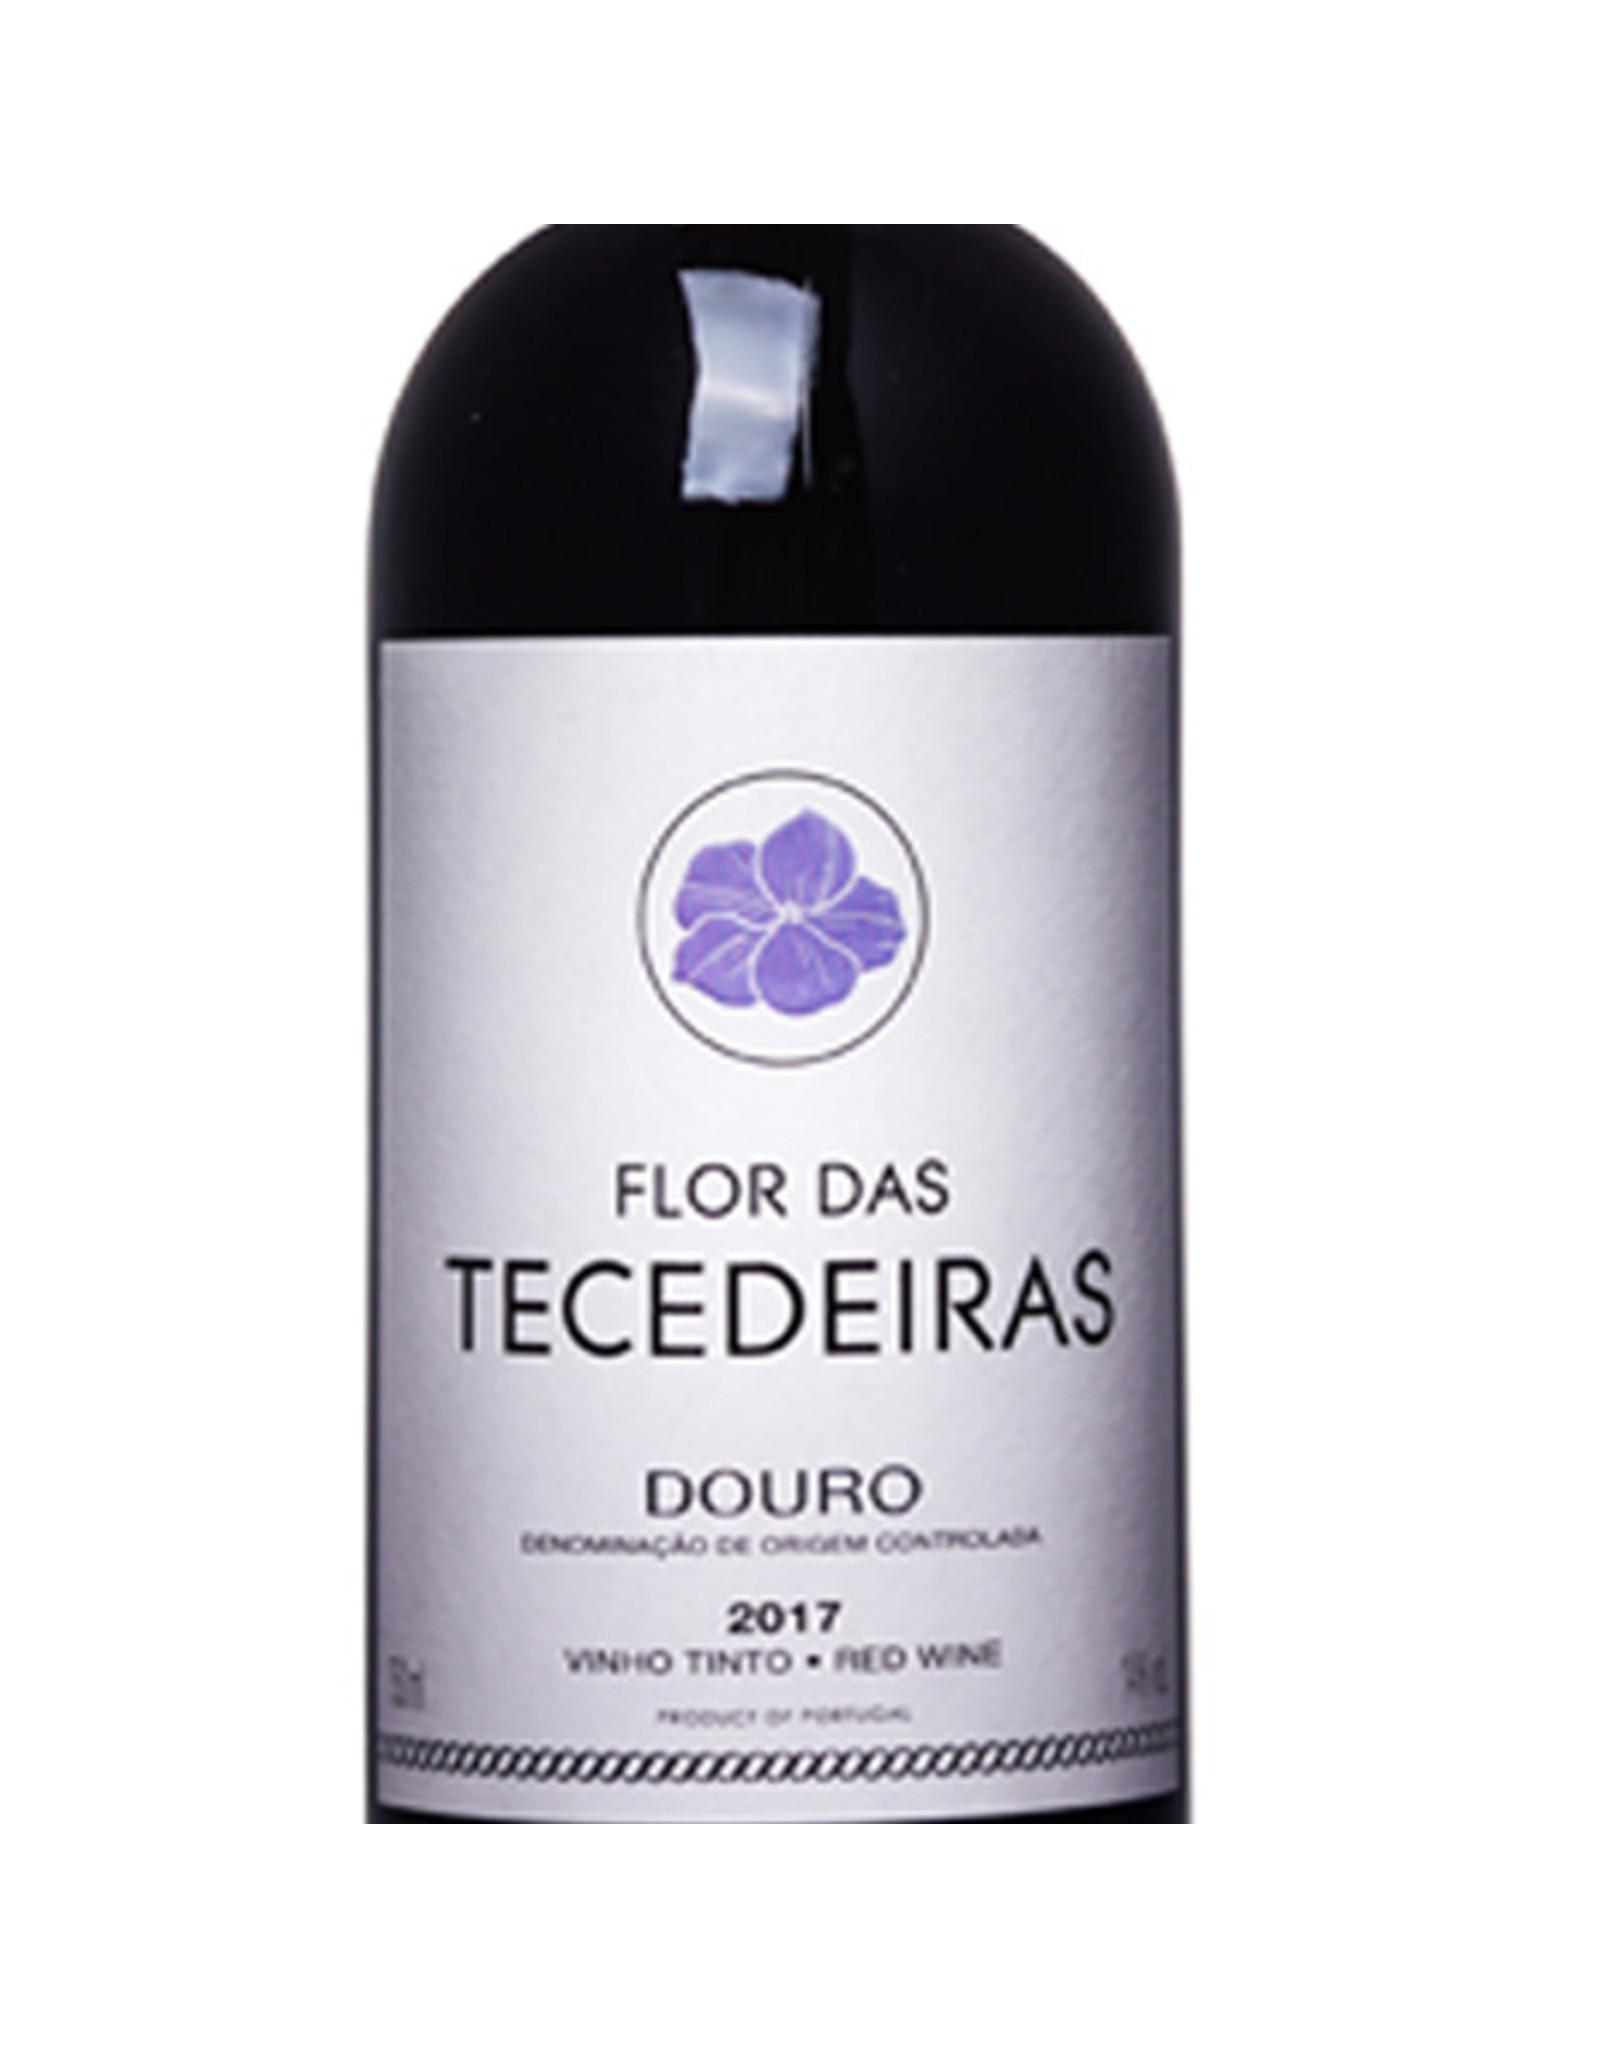 Quinta das Tecedeiras Flor Jeroboam red 2016  3l